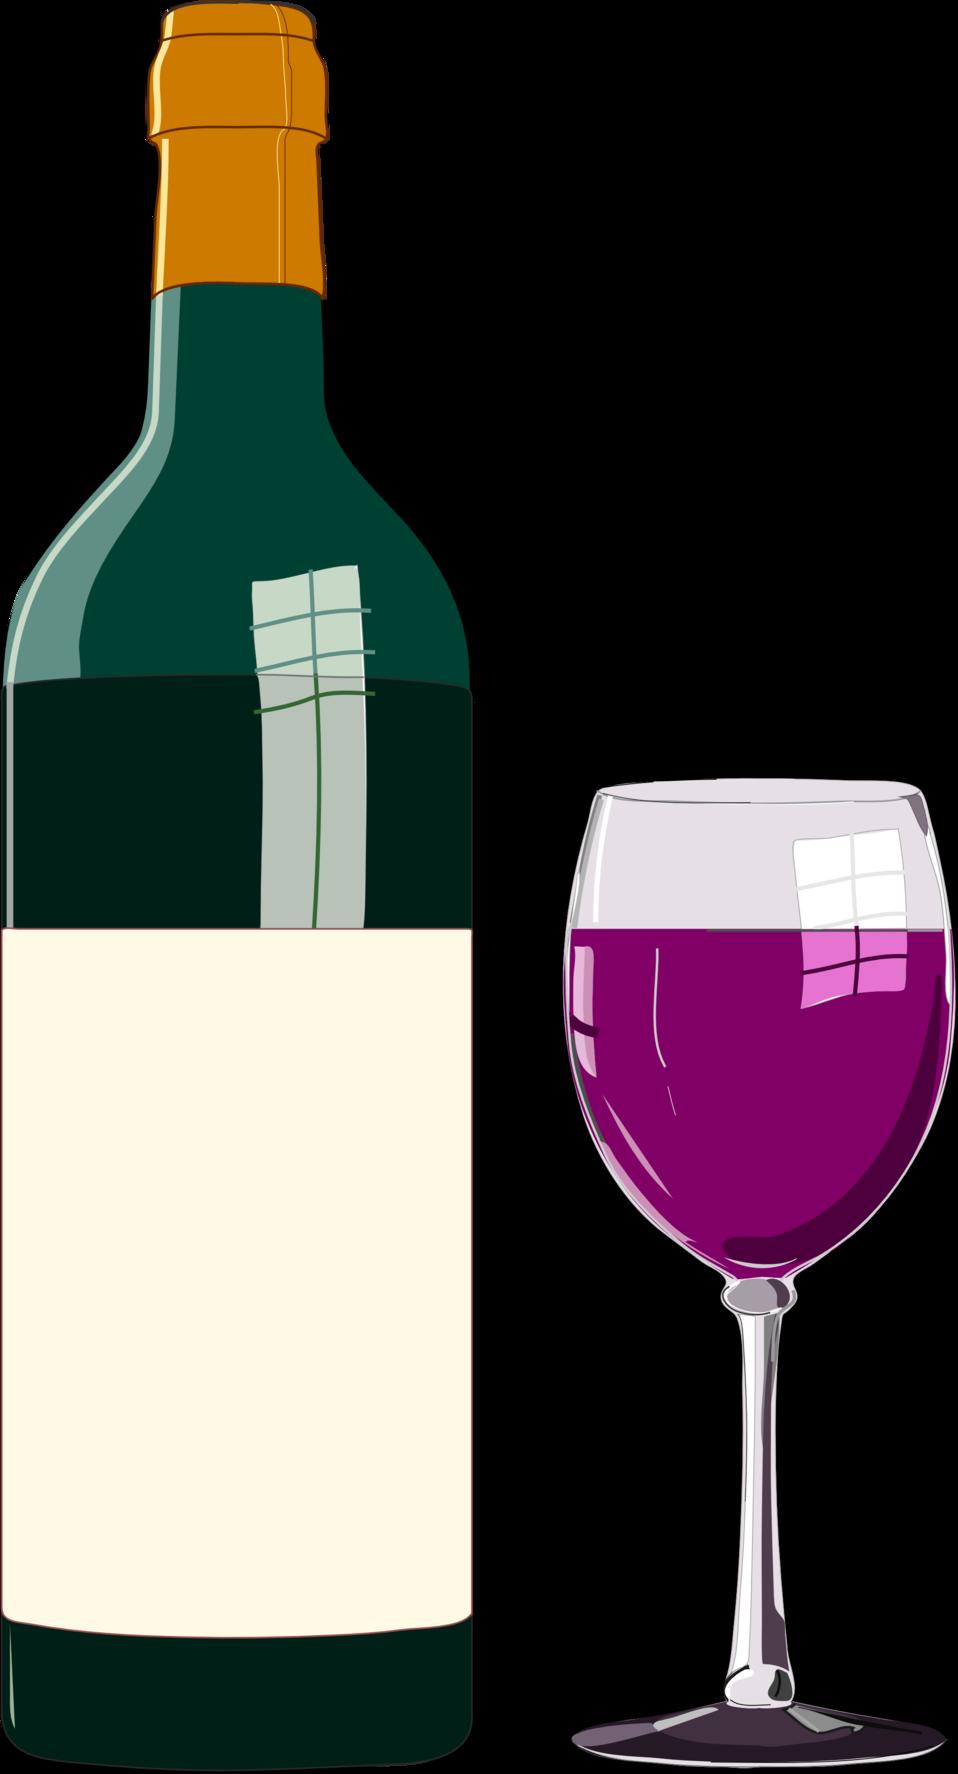 Wine glass 60 clipart clip download Public Domain Clip Art Image | Wine bottle and glass | ID ... clip download